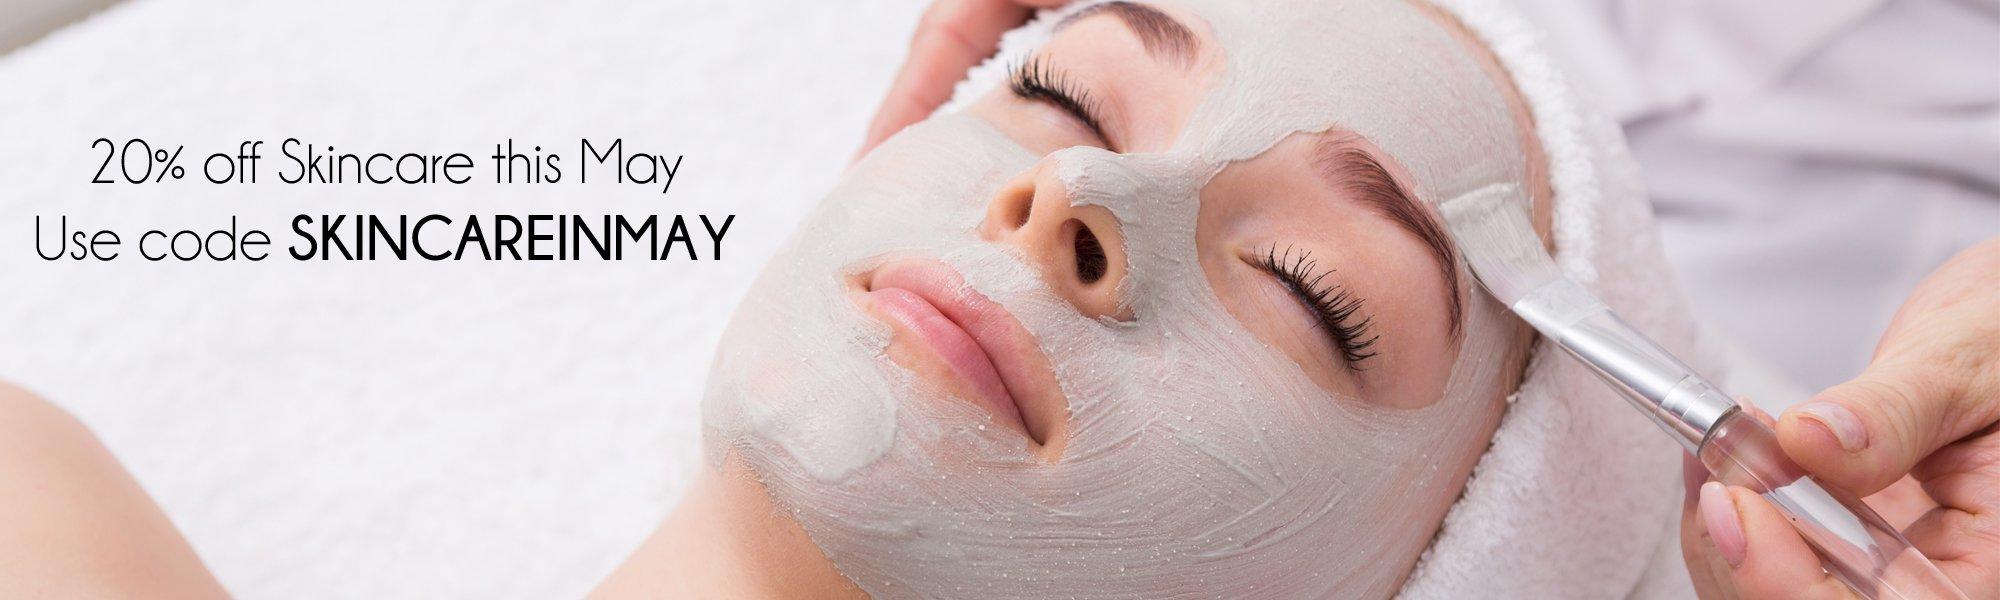 Skincare 20% off